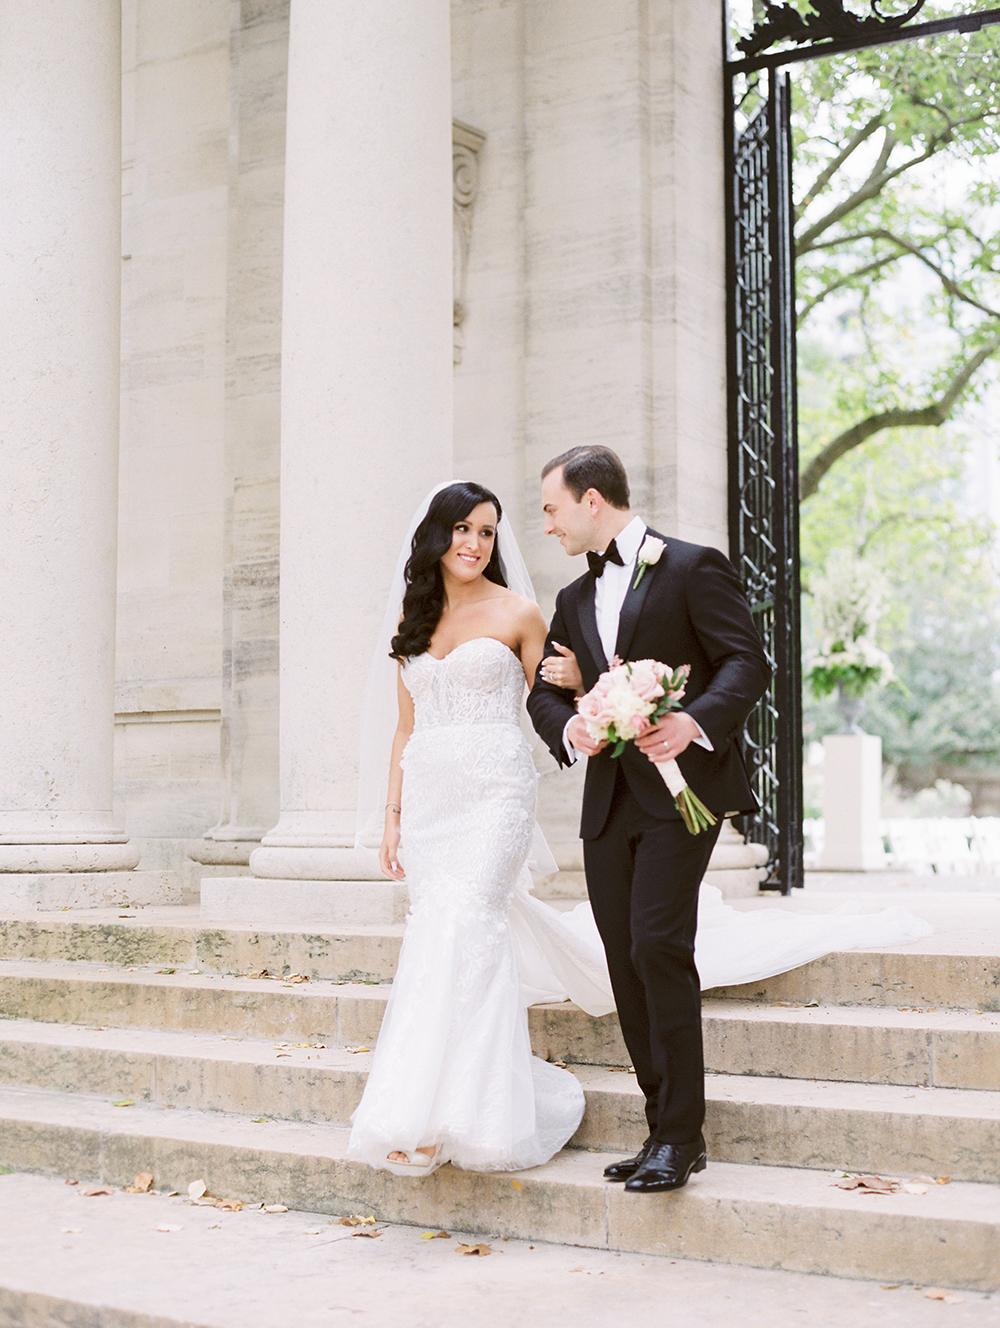 Romantic City Wedding in Philadelphia Kristen Weaver27